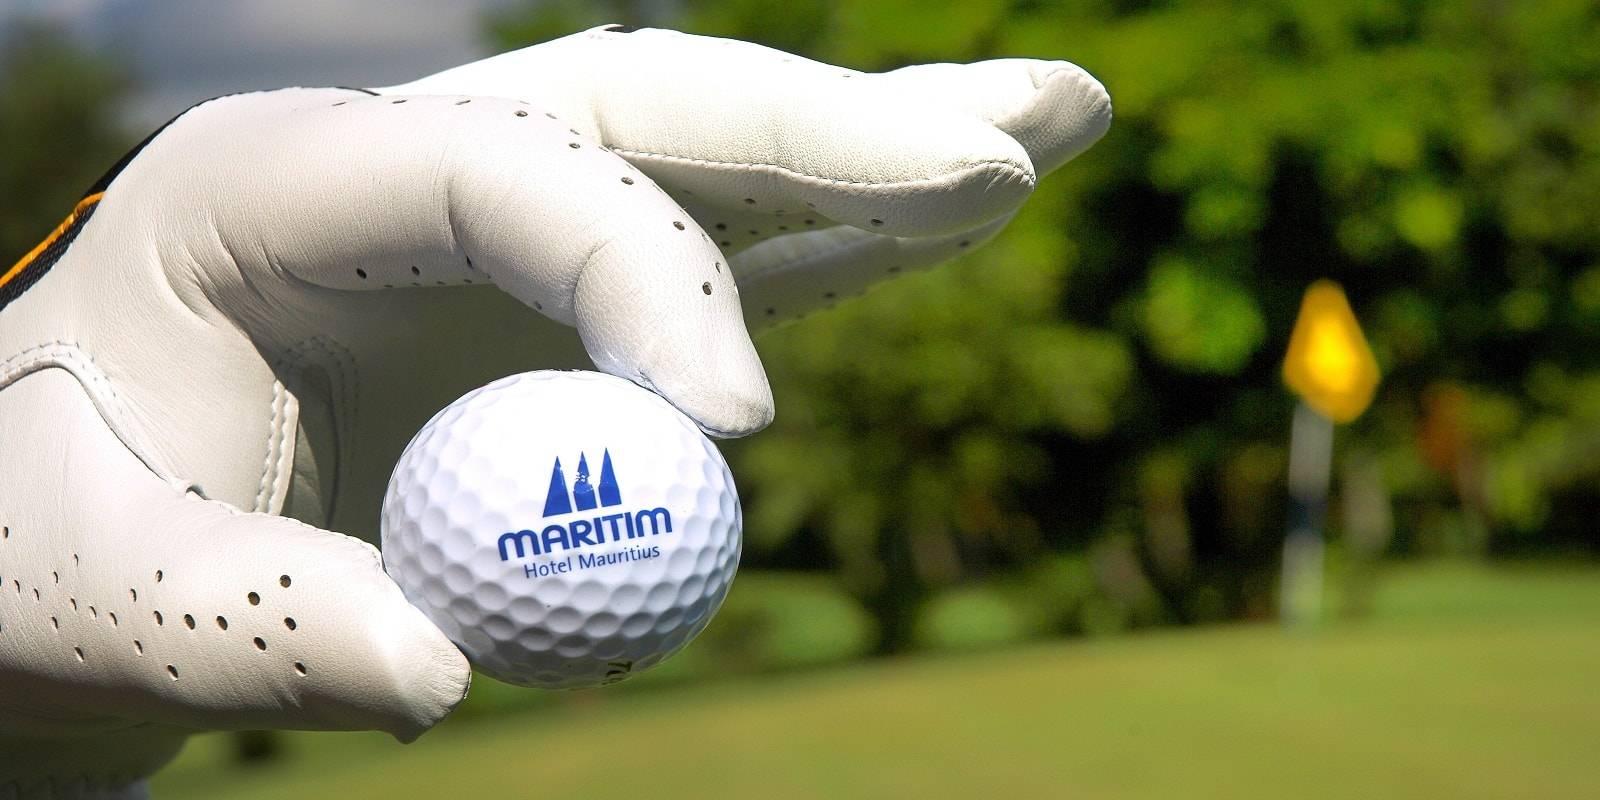 Maritim Golf Club in the North of Mauritius